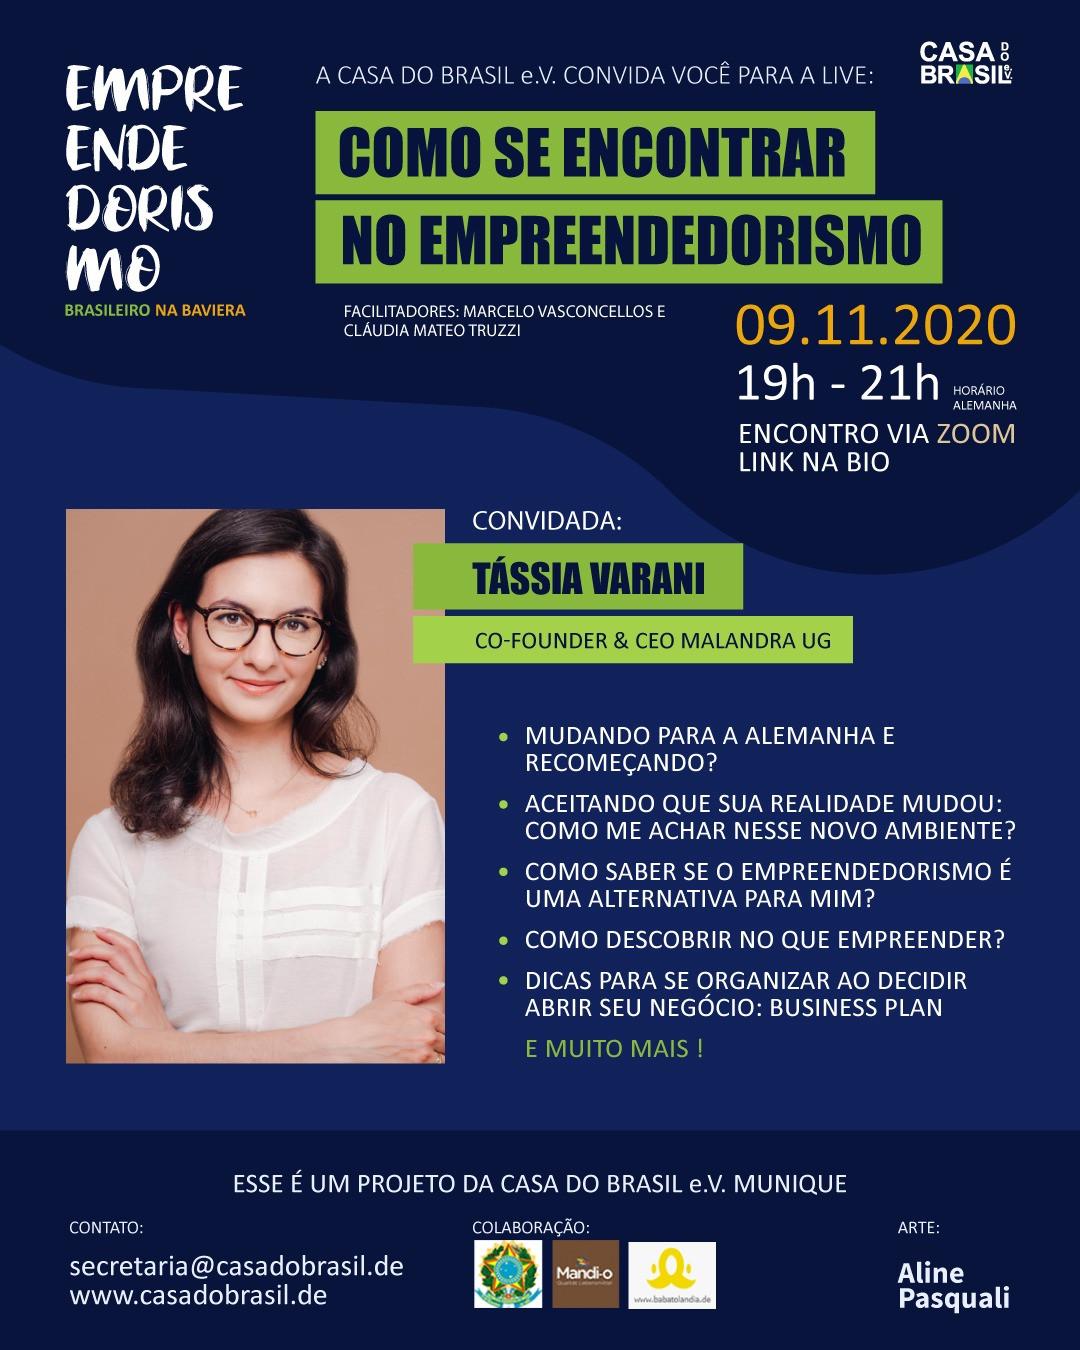 empreendedorismo-brasileiro-na-baviera-tassia-varani